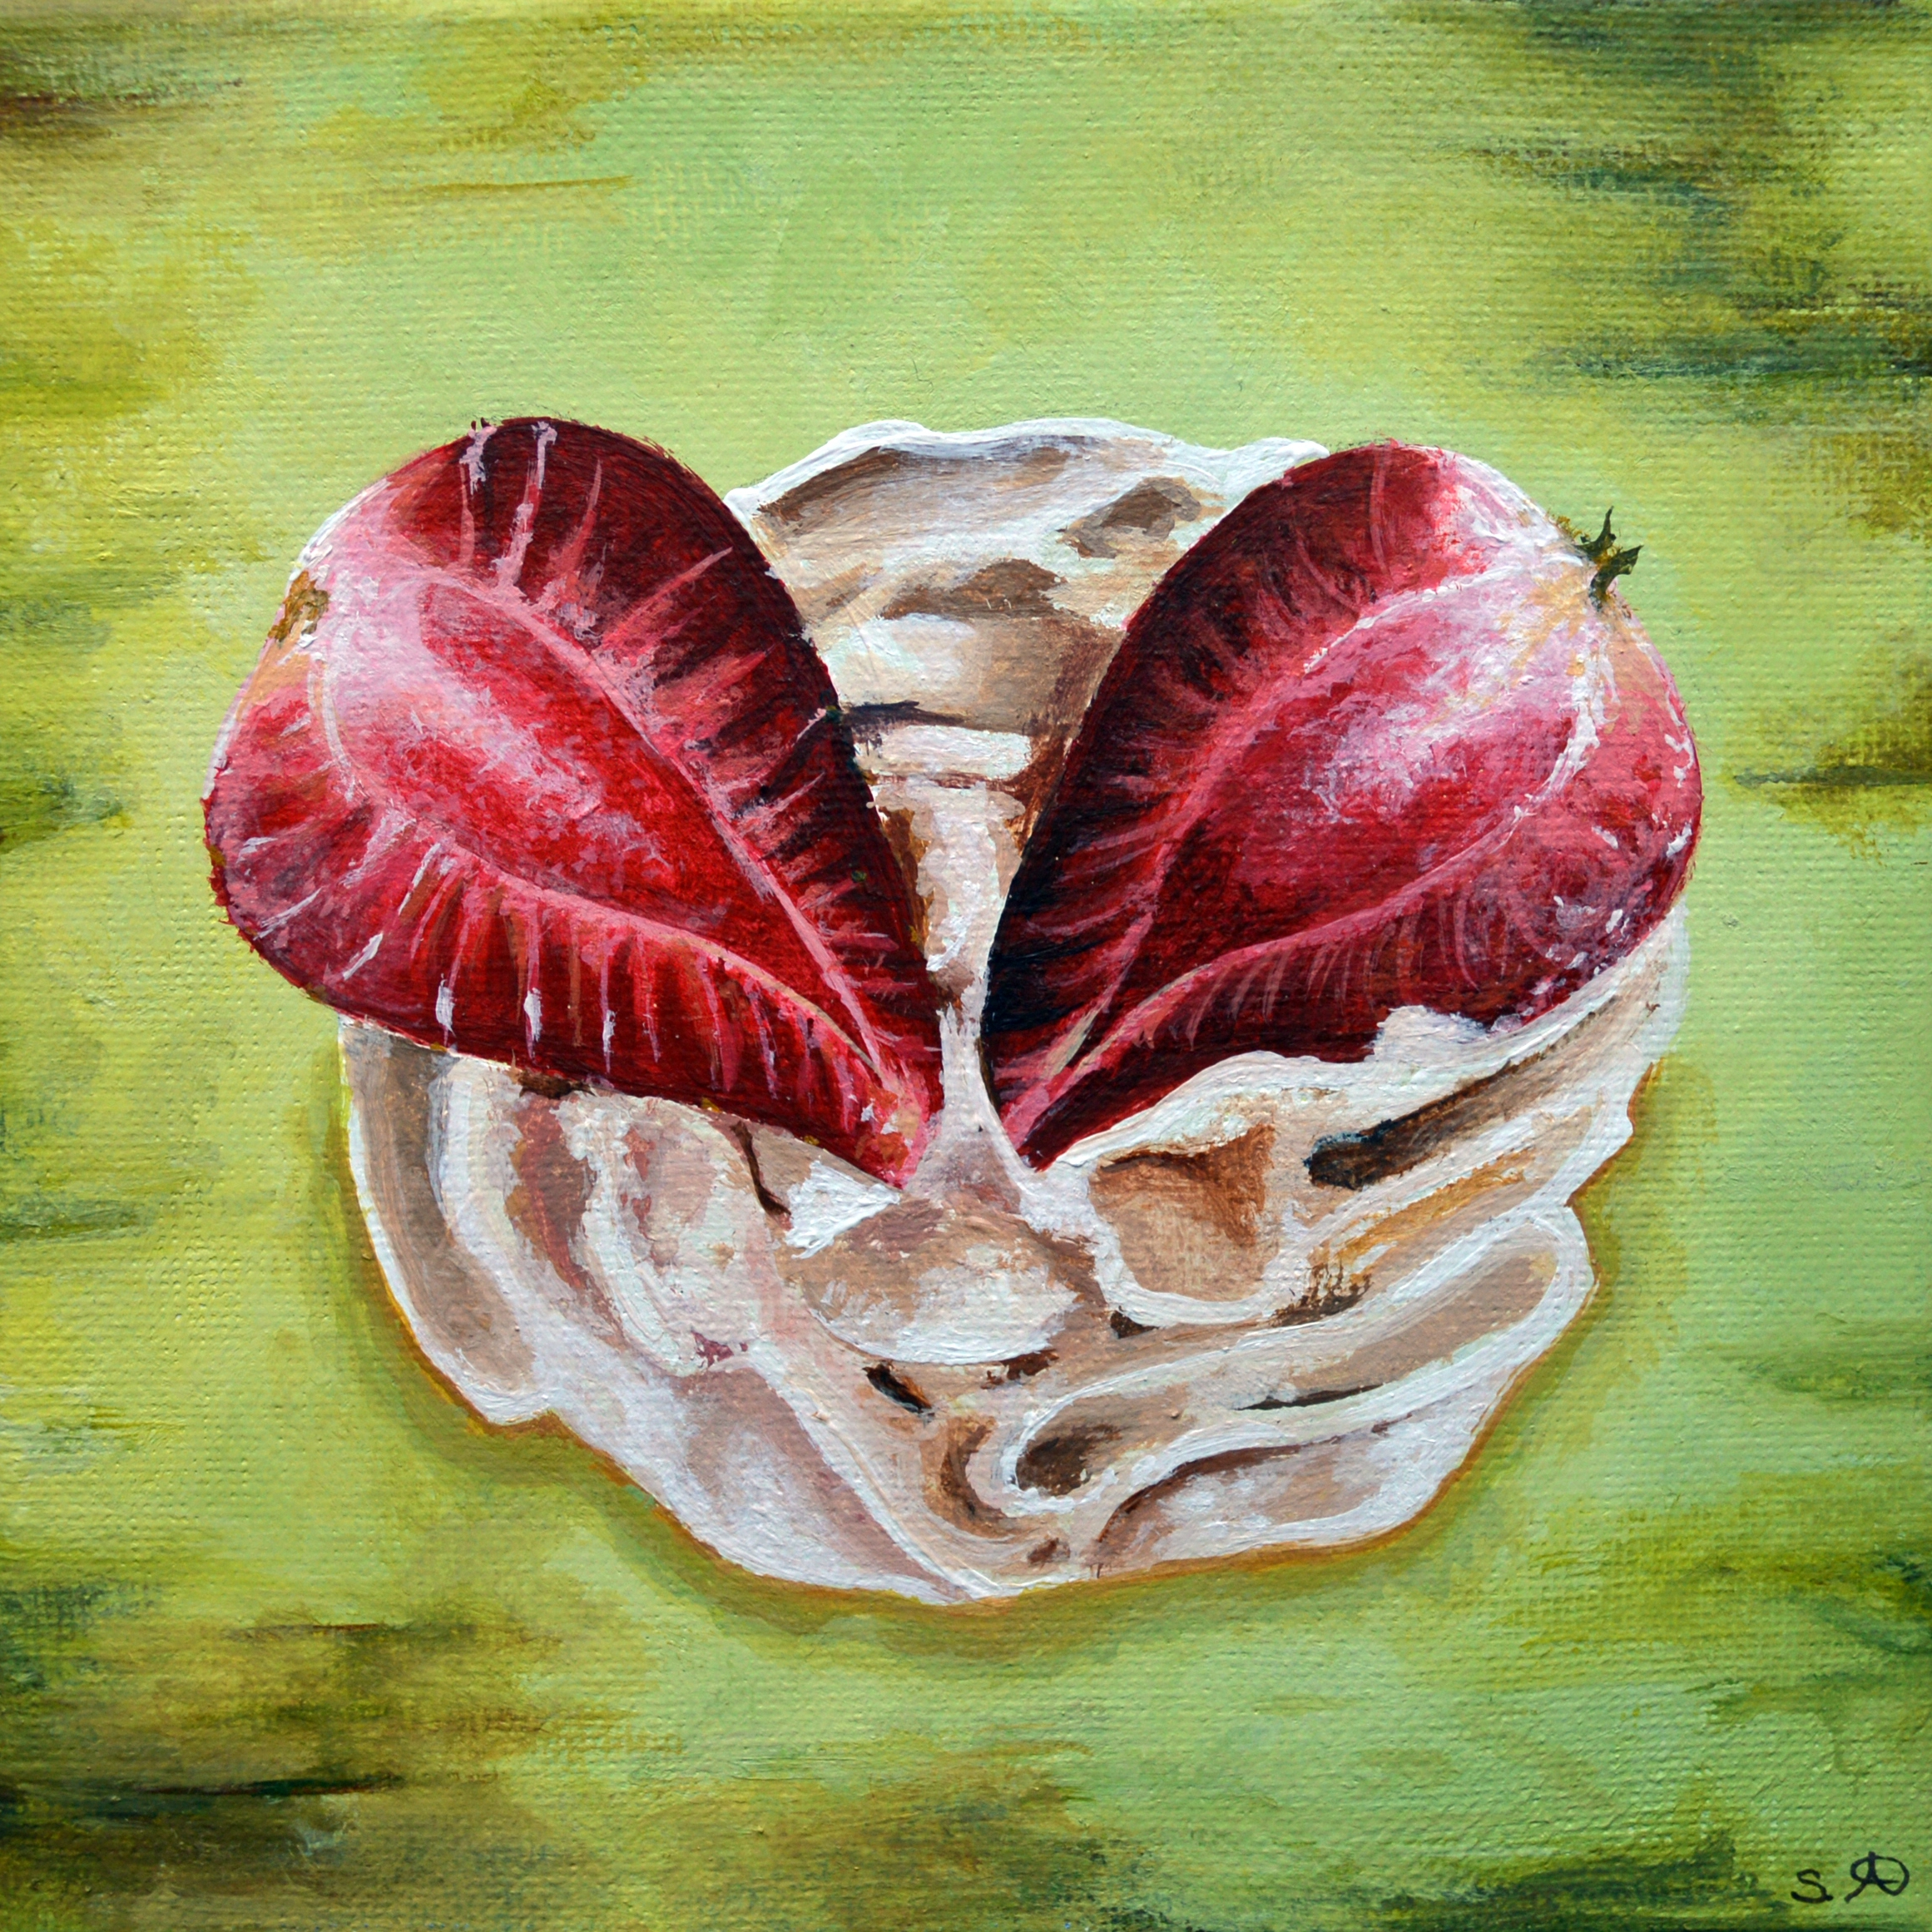 Summer Fruits: Strawberries & Cream